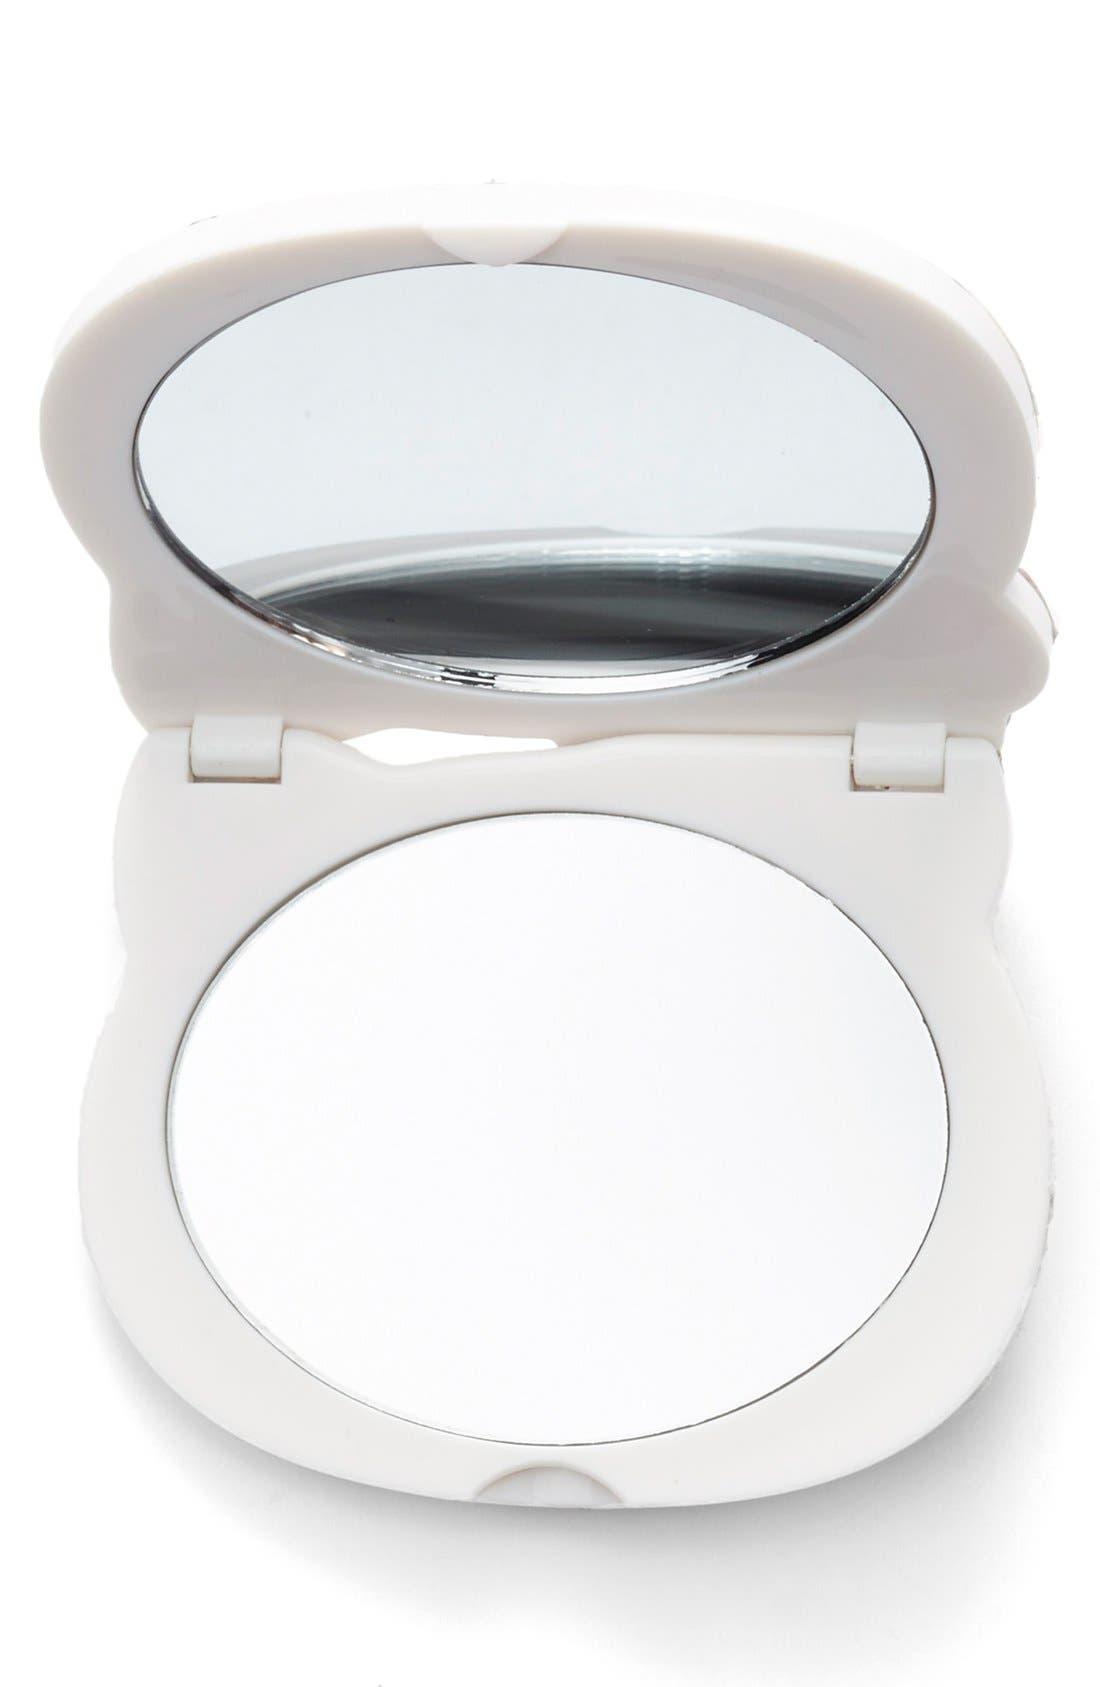 Sanrio 'Hello Kitty<sup>®</sup>' Compact Mirror,                             Alternate thumbnail 2, color,                             600